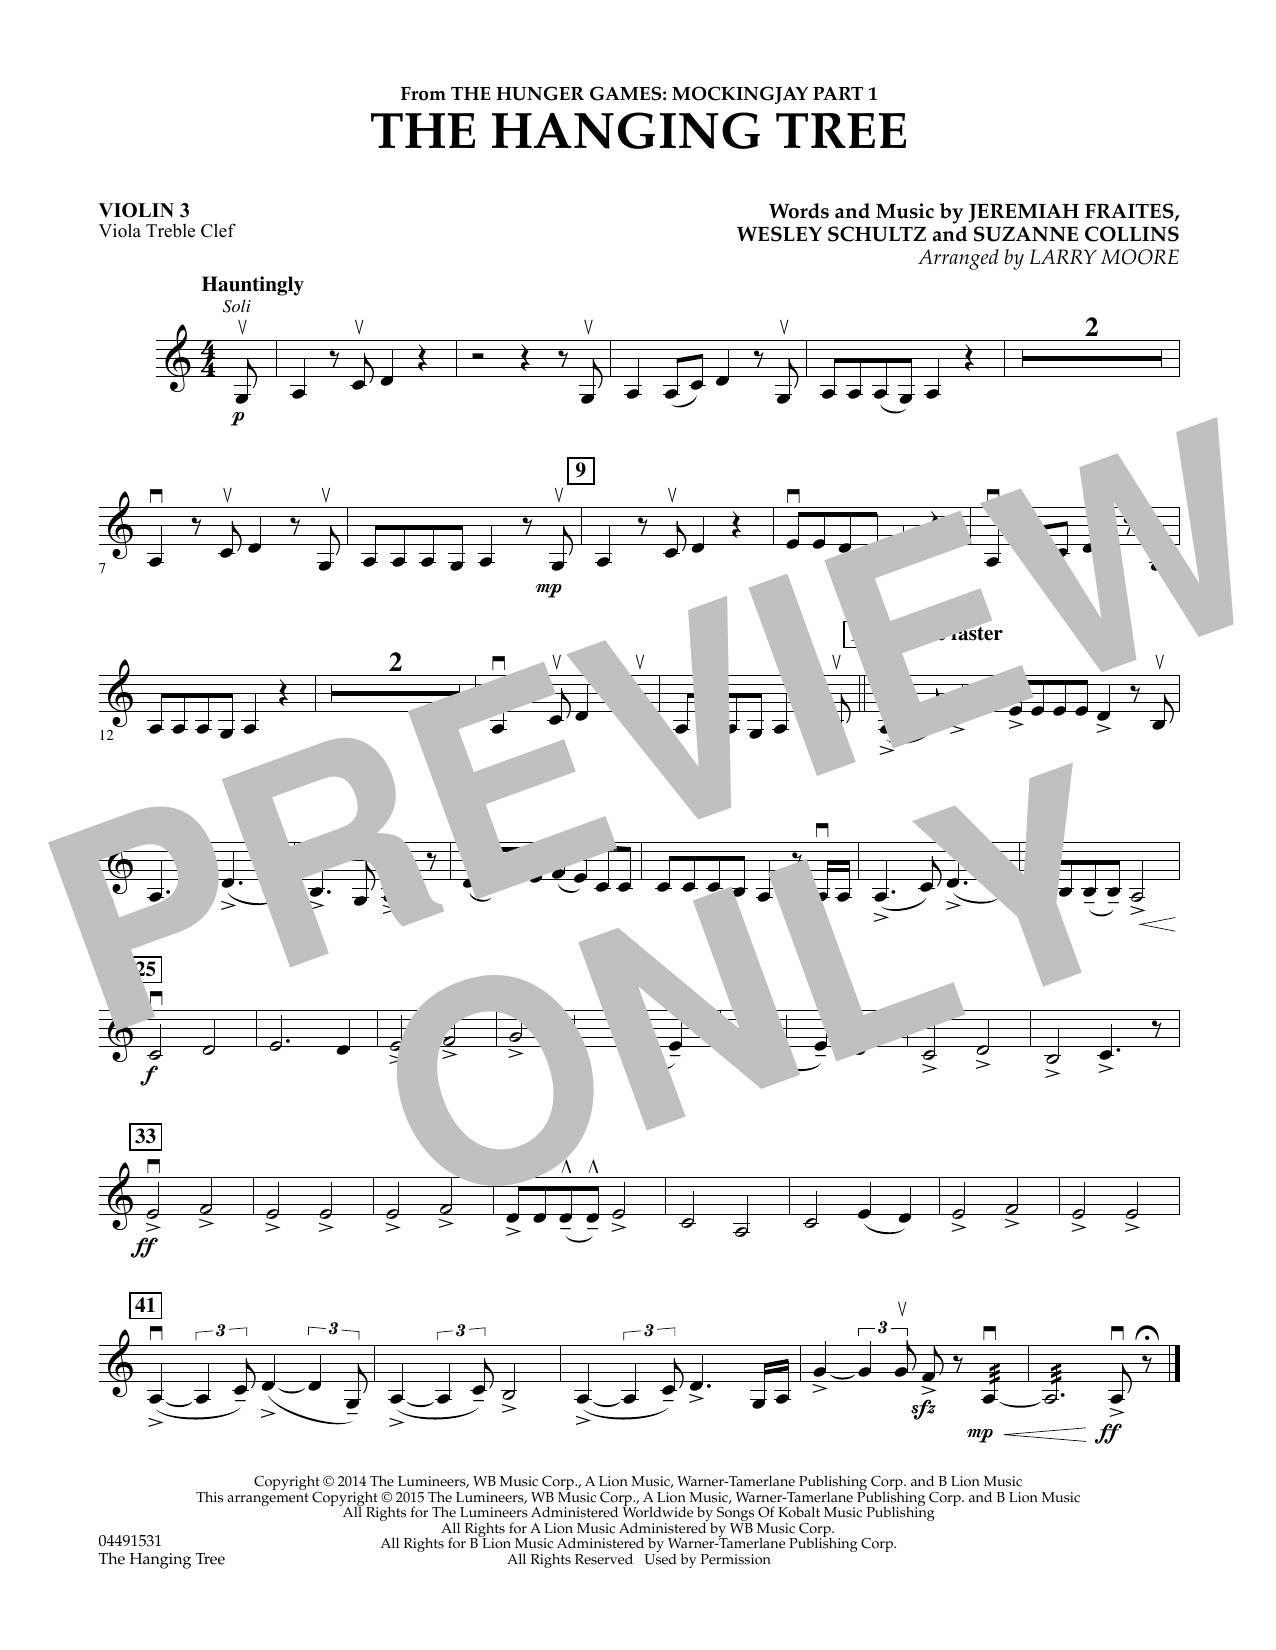 The Hanging Tree - Violin 3 (Viola Treble Clef) (Orchestra)